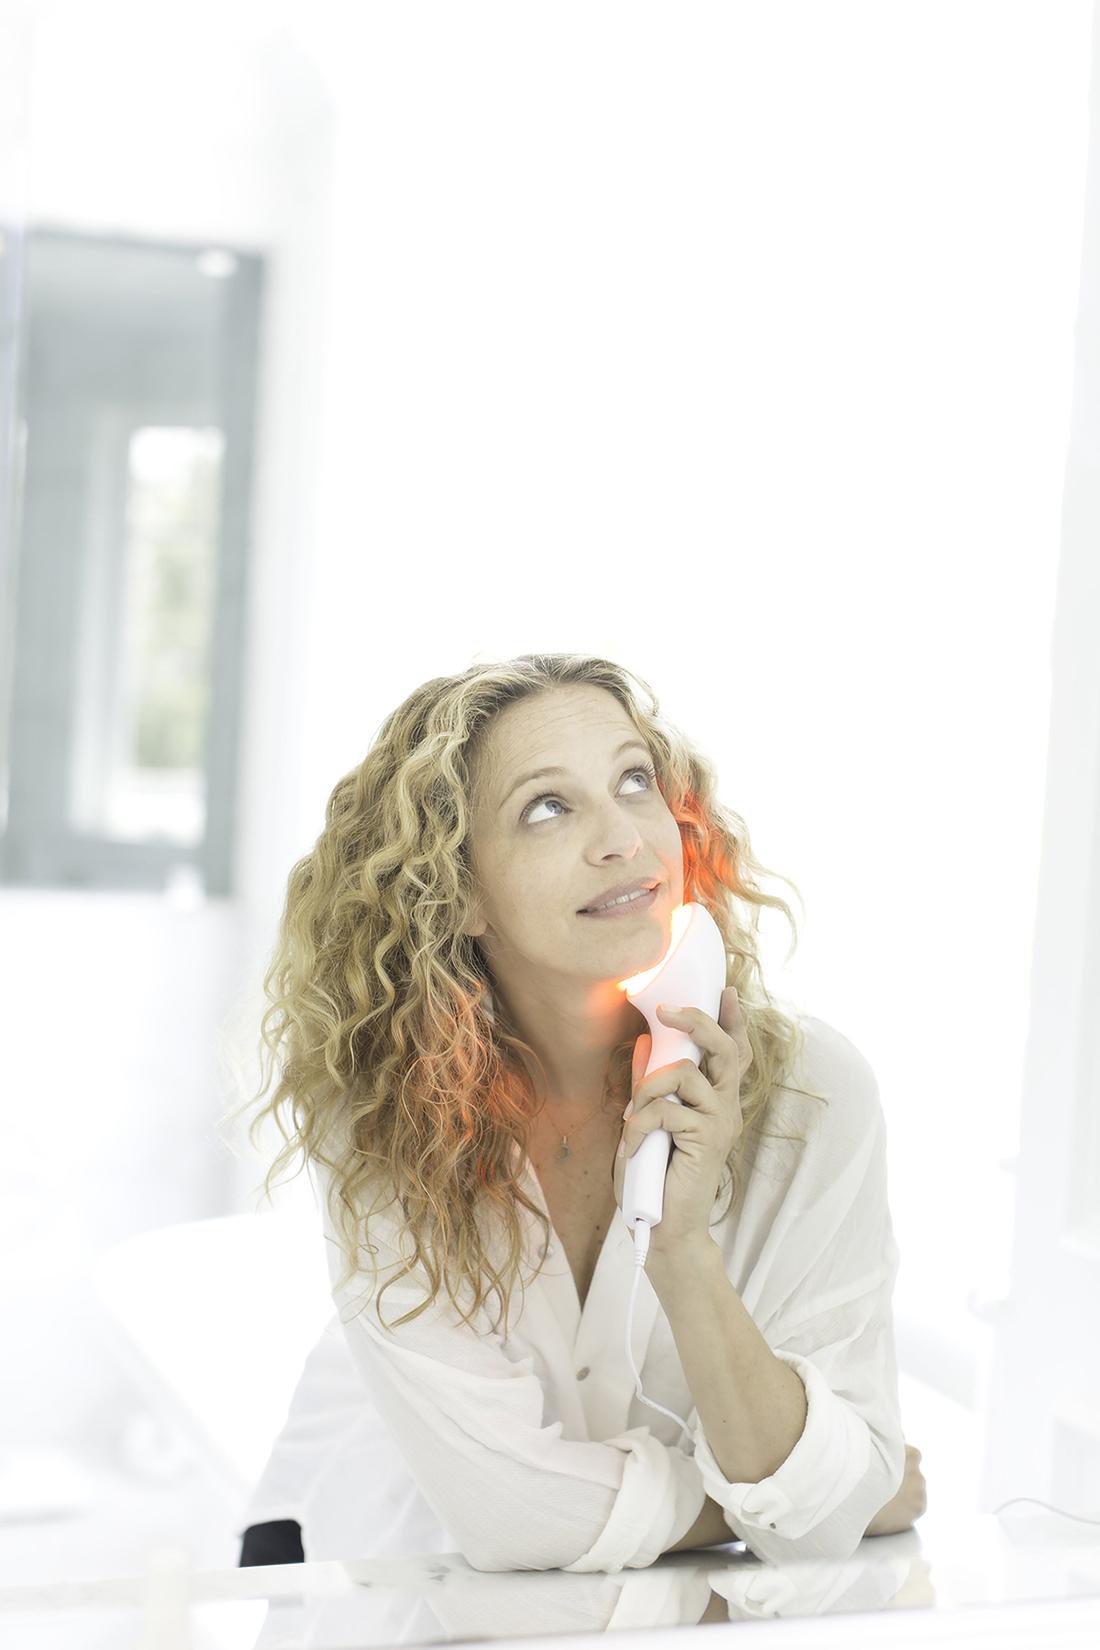 Beauty Gadgets: Lightstim